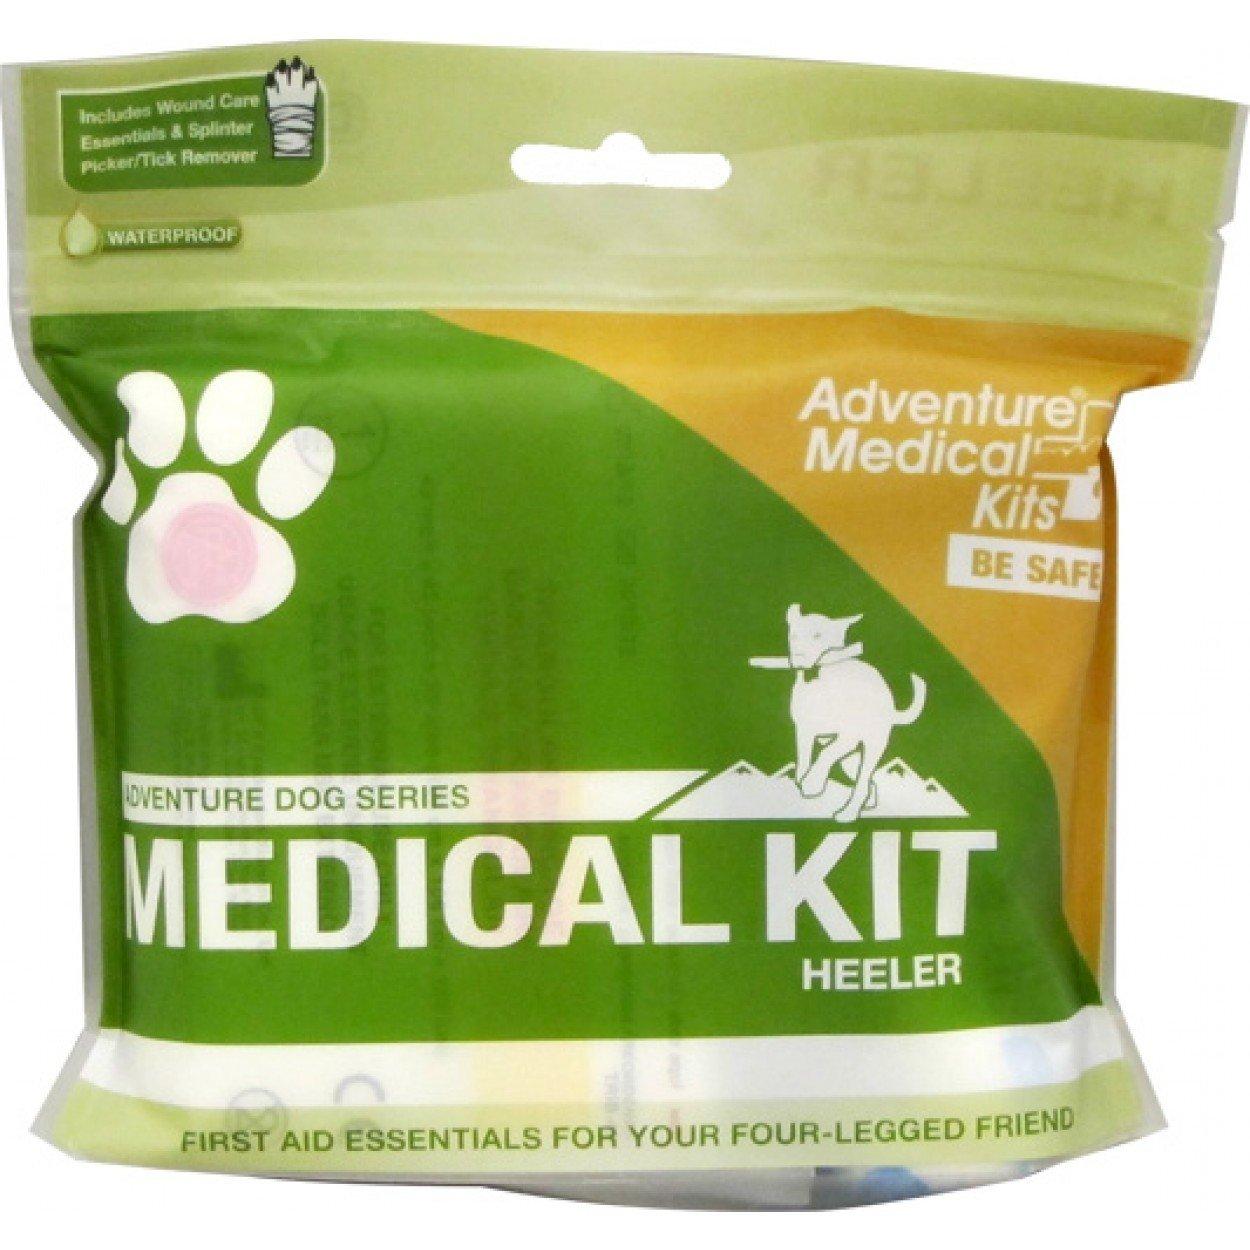 Adventure Medical Kit Adventure Dog Series Heeler JR1AMKdog